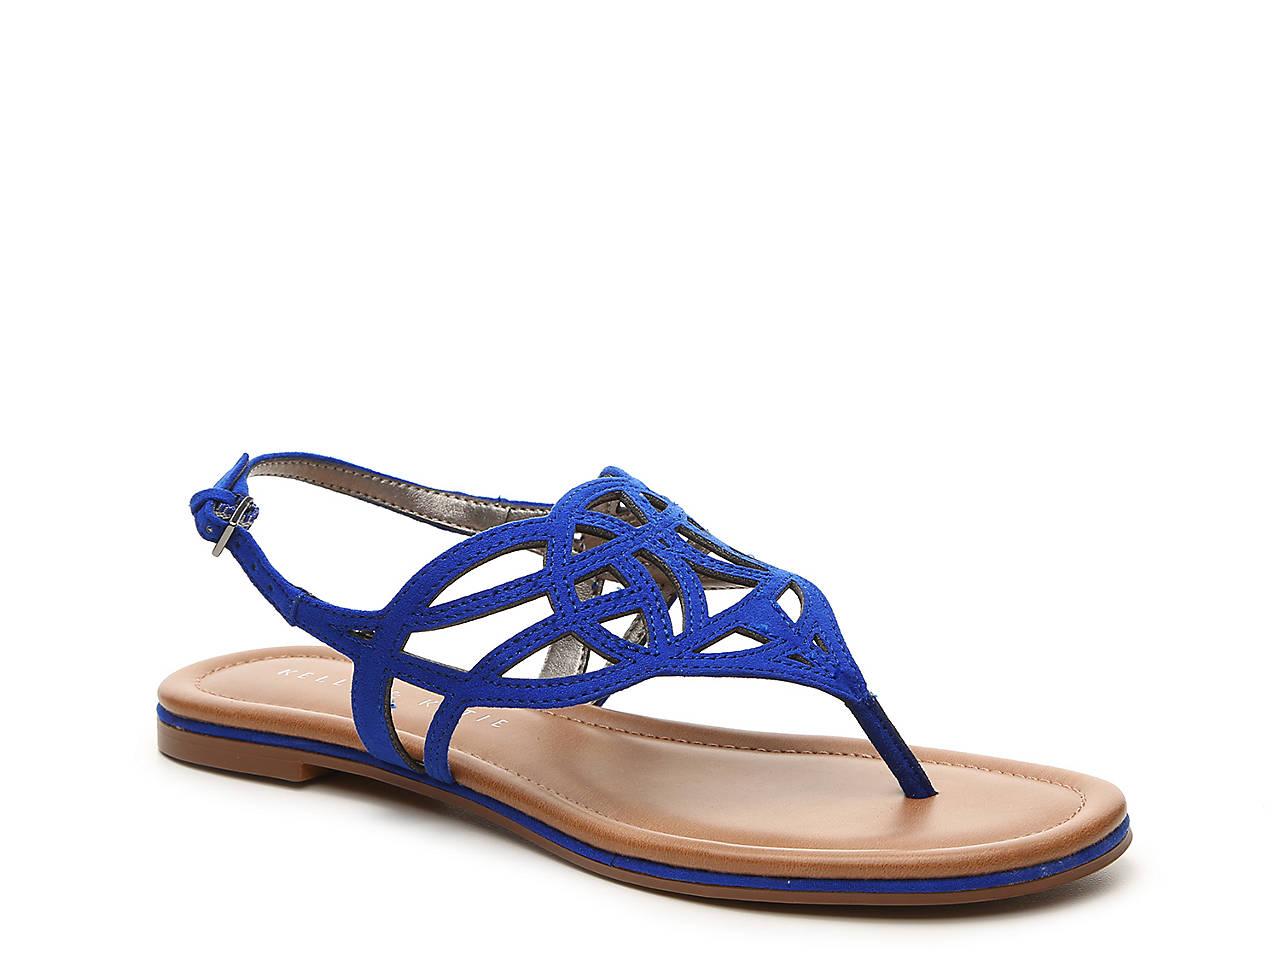 Black sandals at dsw - Dsw Shoes For Women Sandals Patrice Fabric Flat Sandal